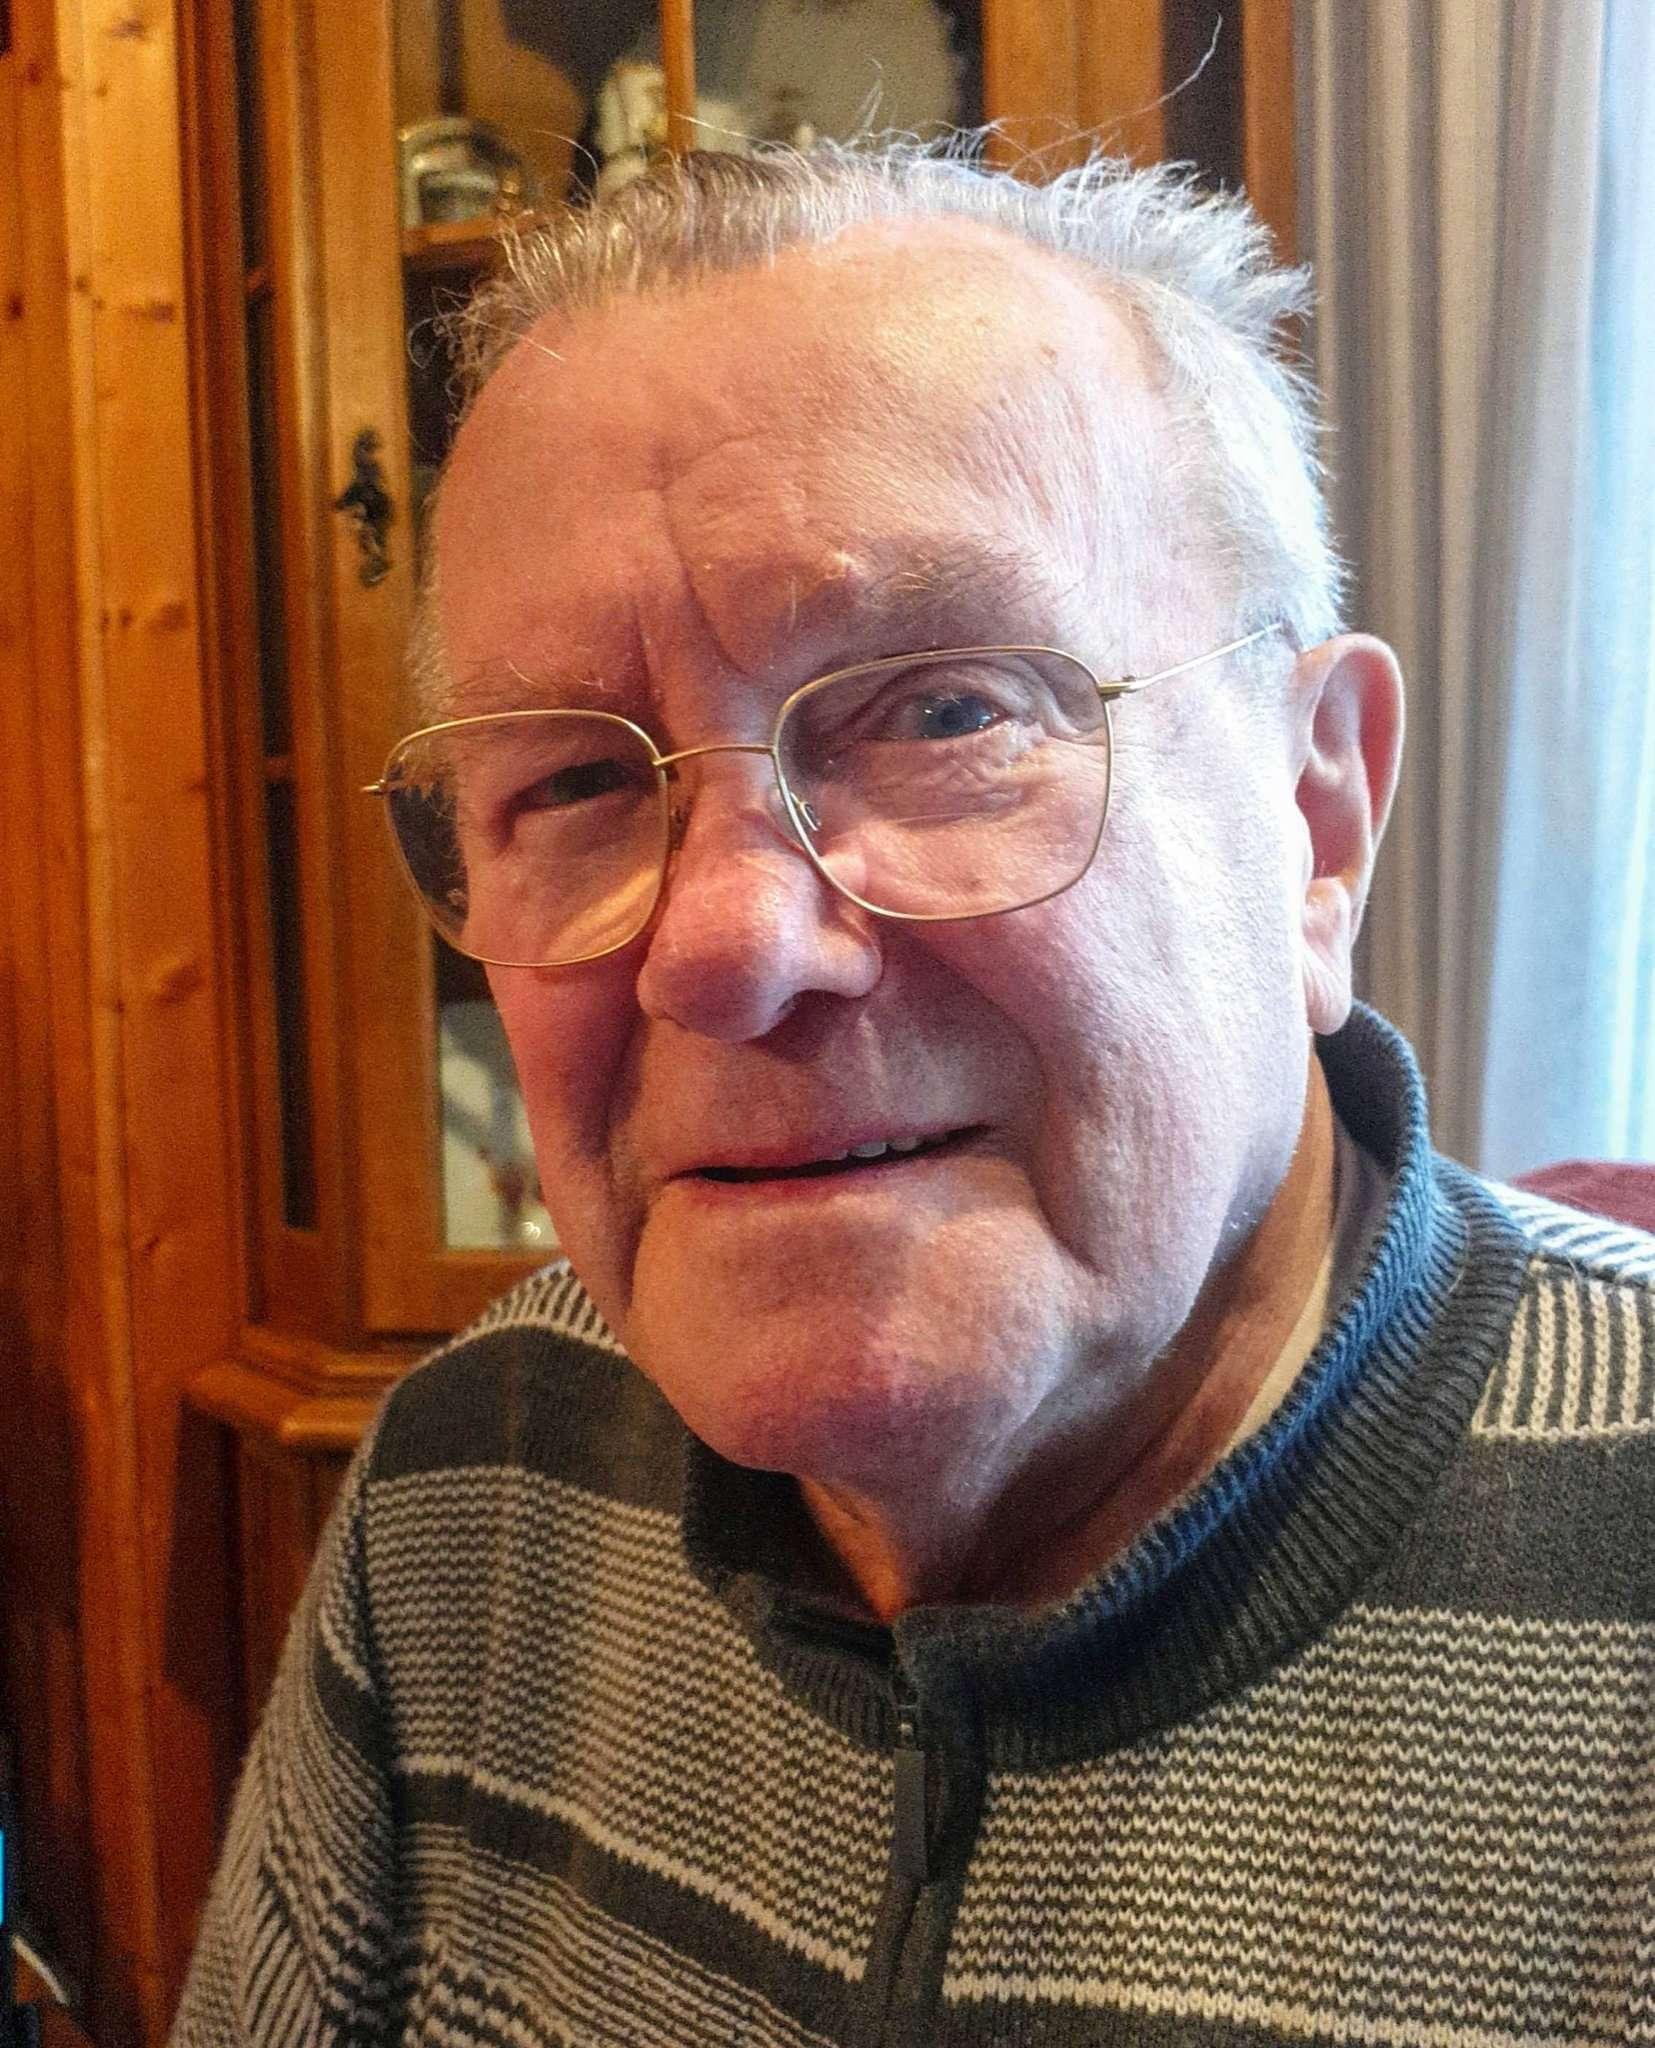 Siegfried Langhans feiert im Januar seinen 90. Geburtstag.